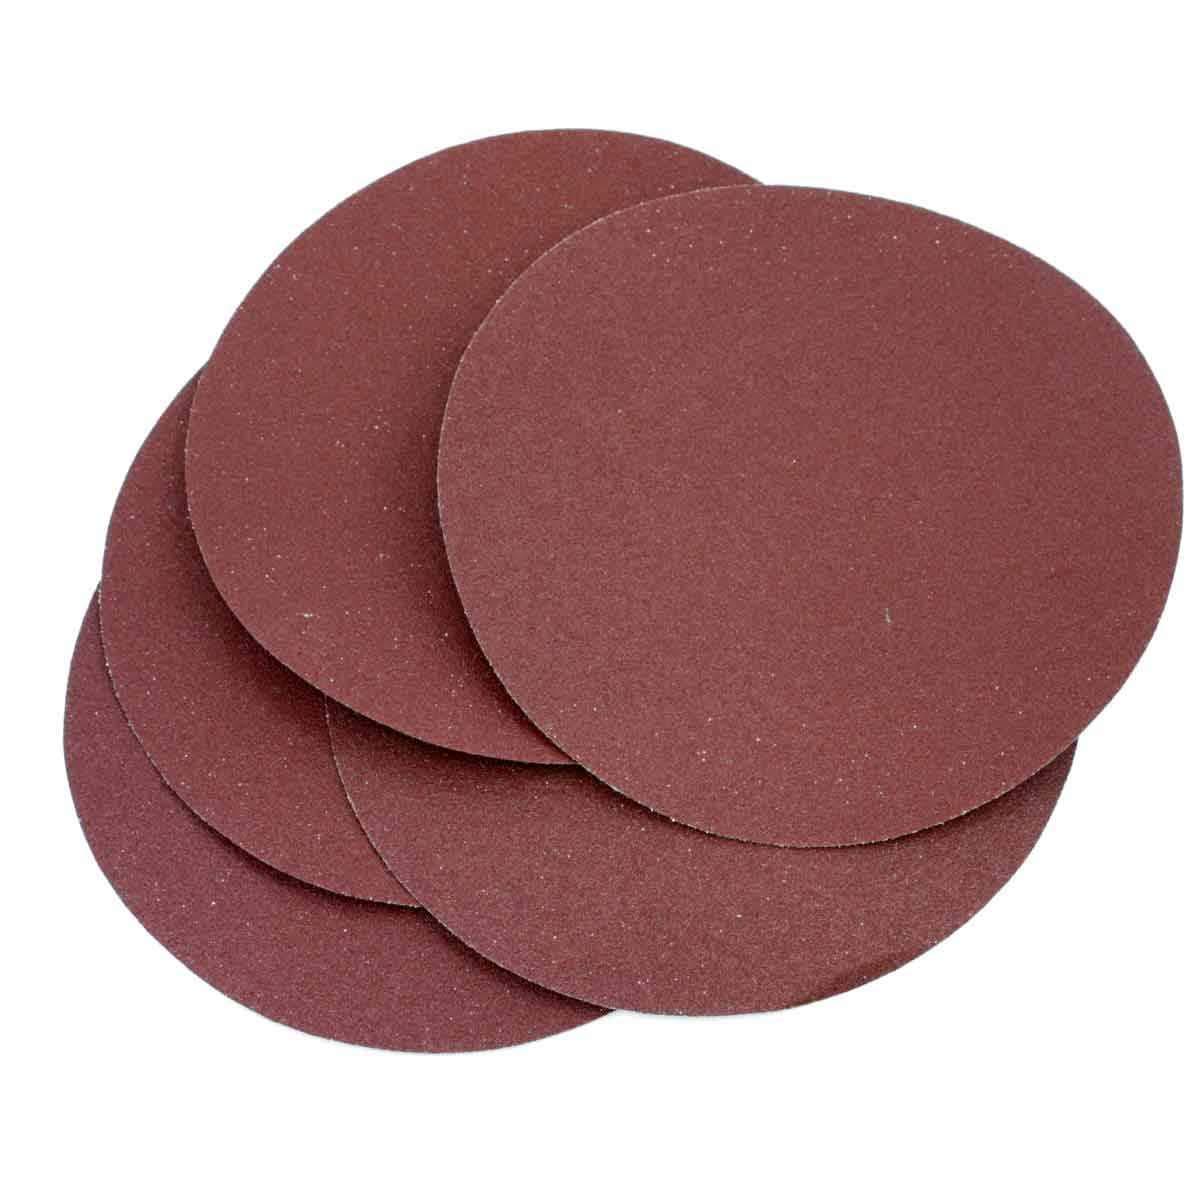 Radius 360 150 Grit Drywall Sanding Discs - 25 Pack